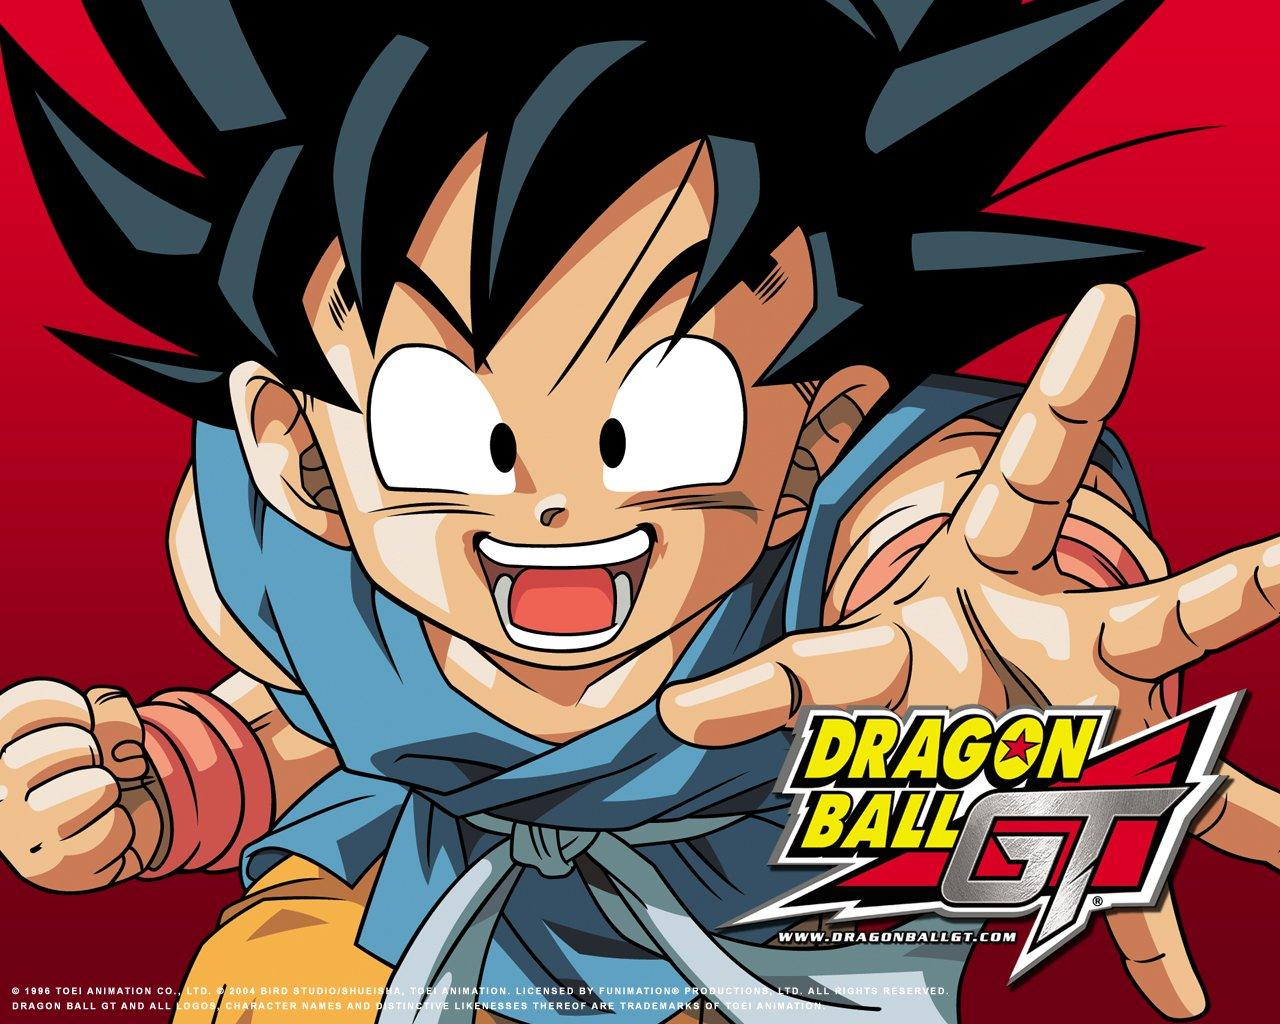 Wallpapers HD Dragon Ball Gt Z Full HD Wallpapers 1280x1024